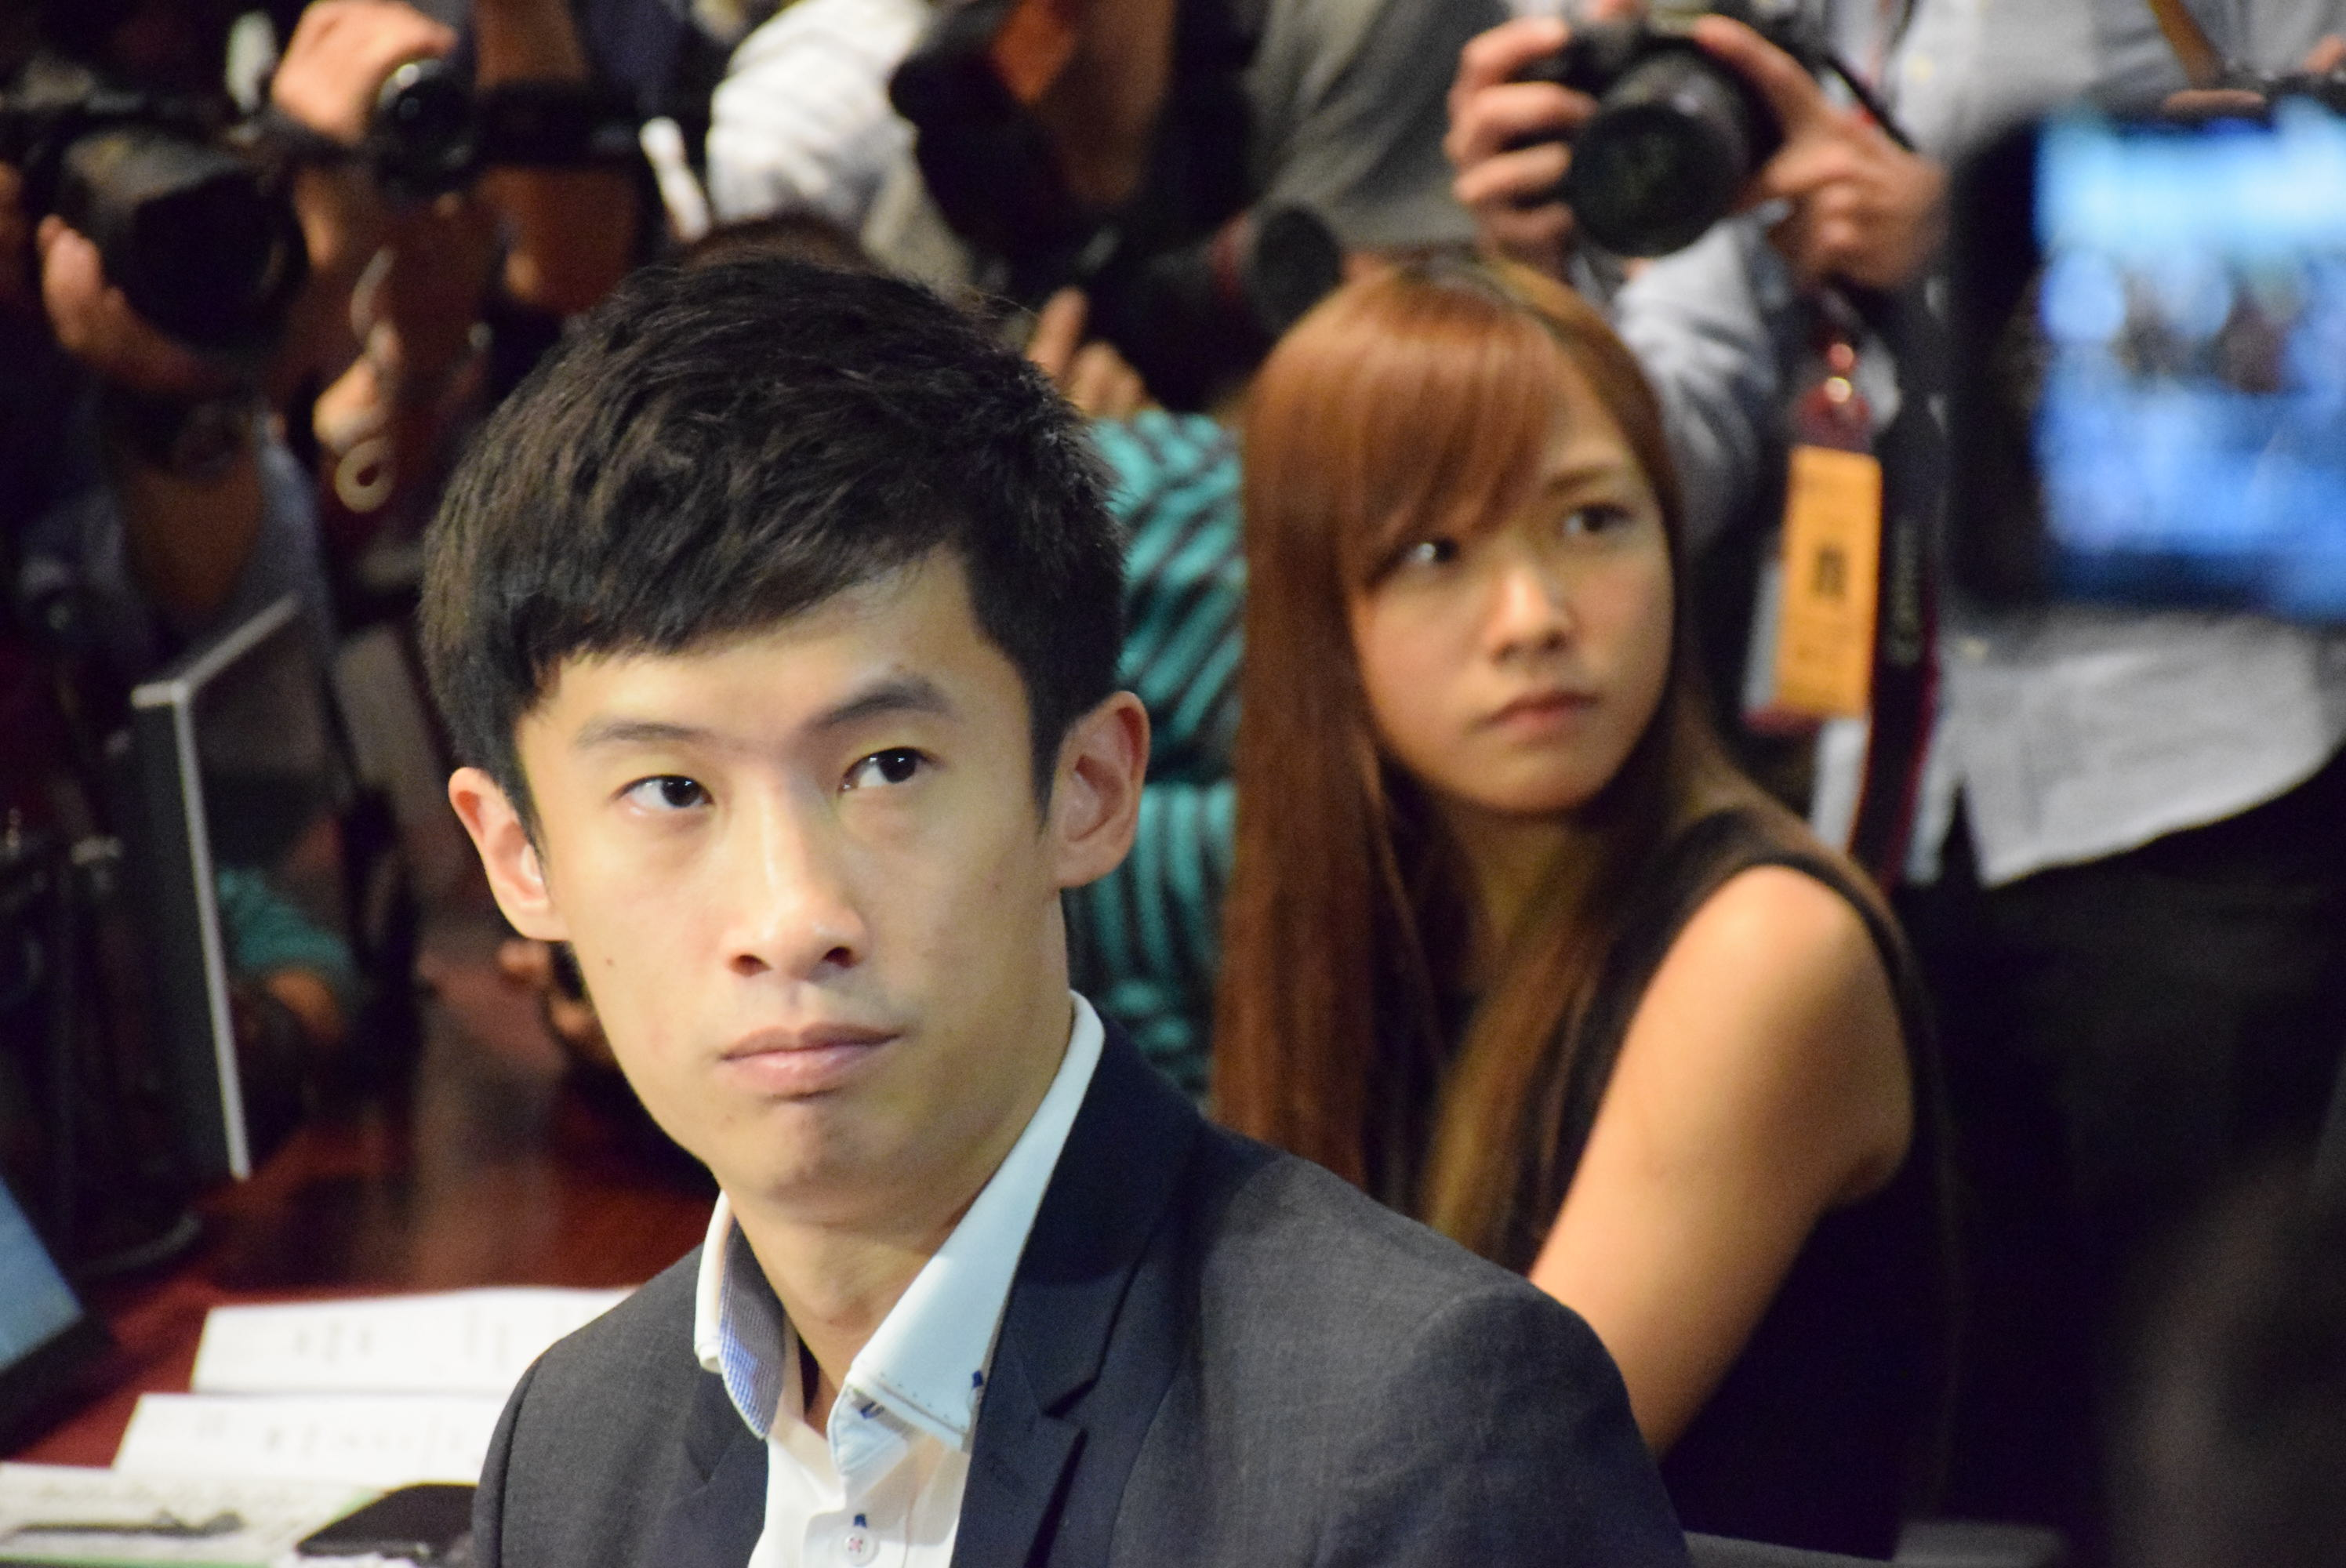 File:梁頌恆及游蕙禎成功進入立法會會議廳.jpg - Wikimedia Commons